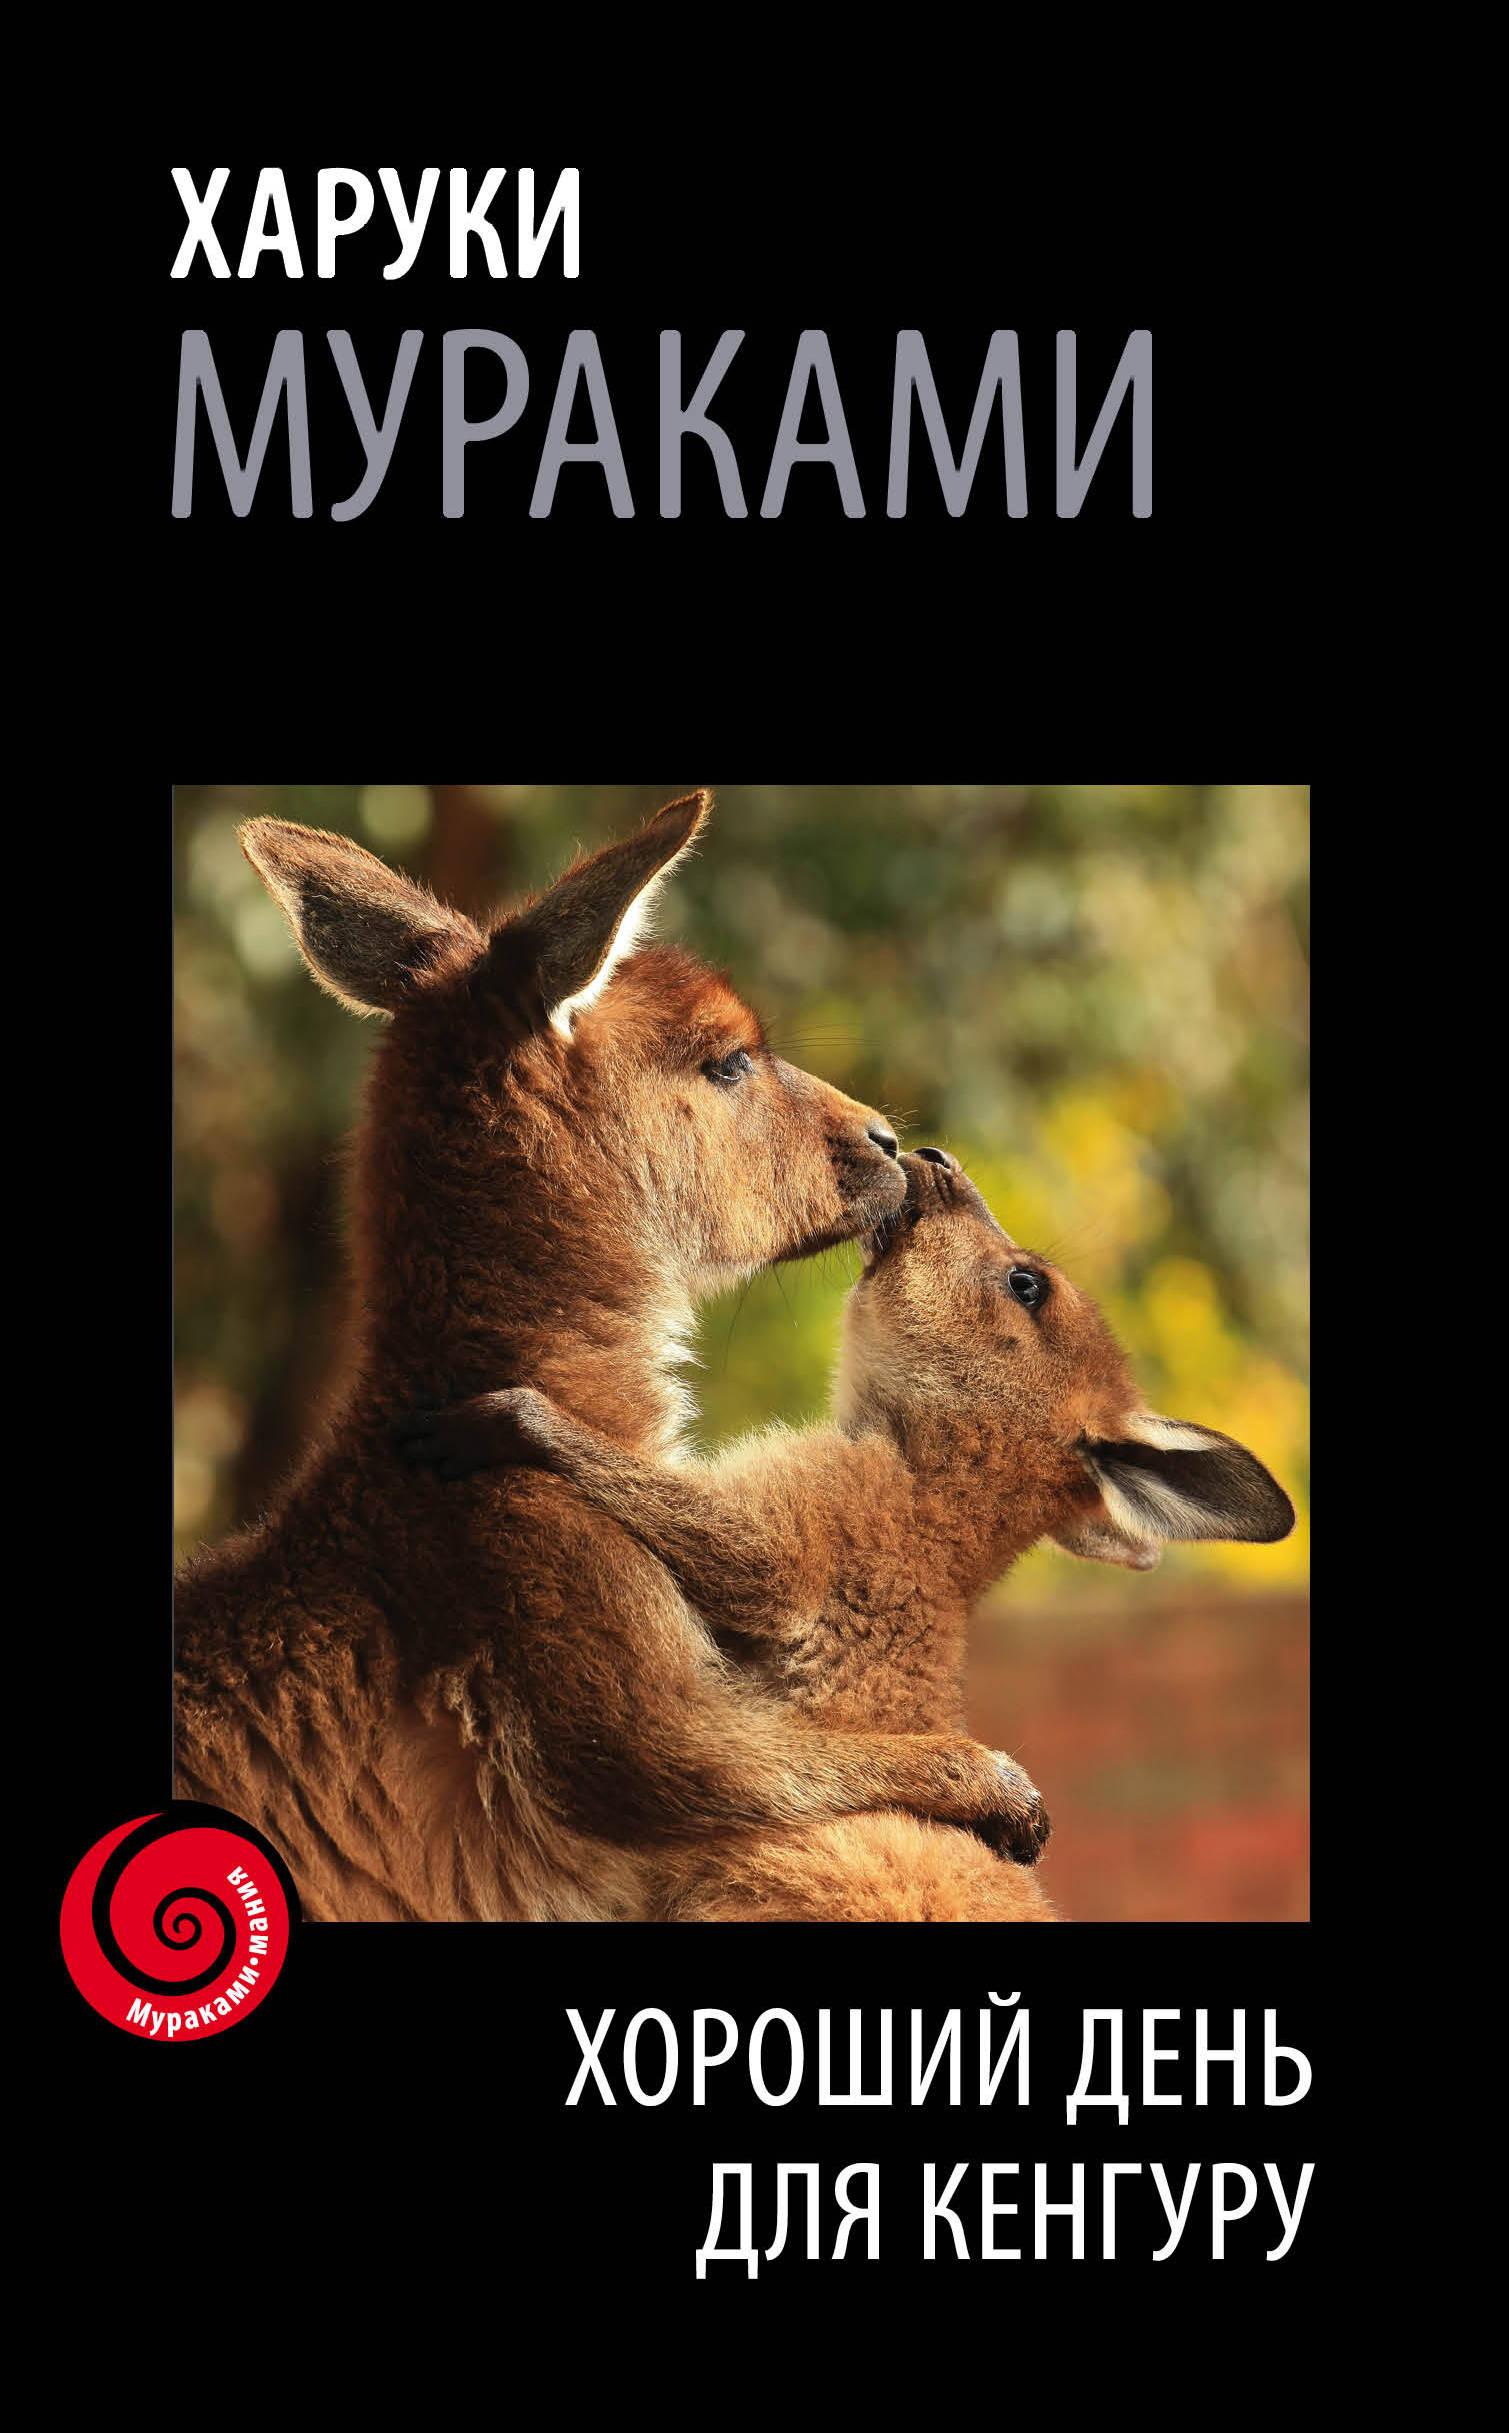 Харуки Мураками «Хороший день для кенгуру (сборник)»